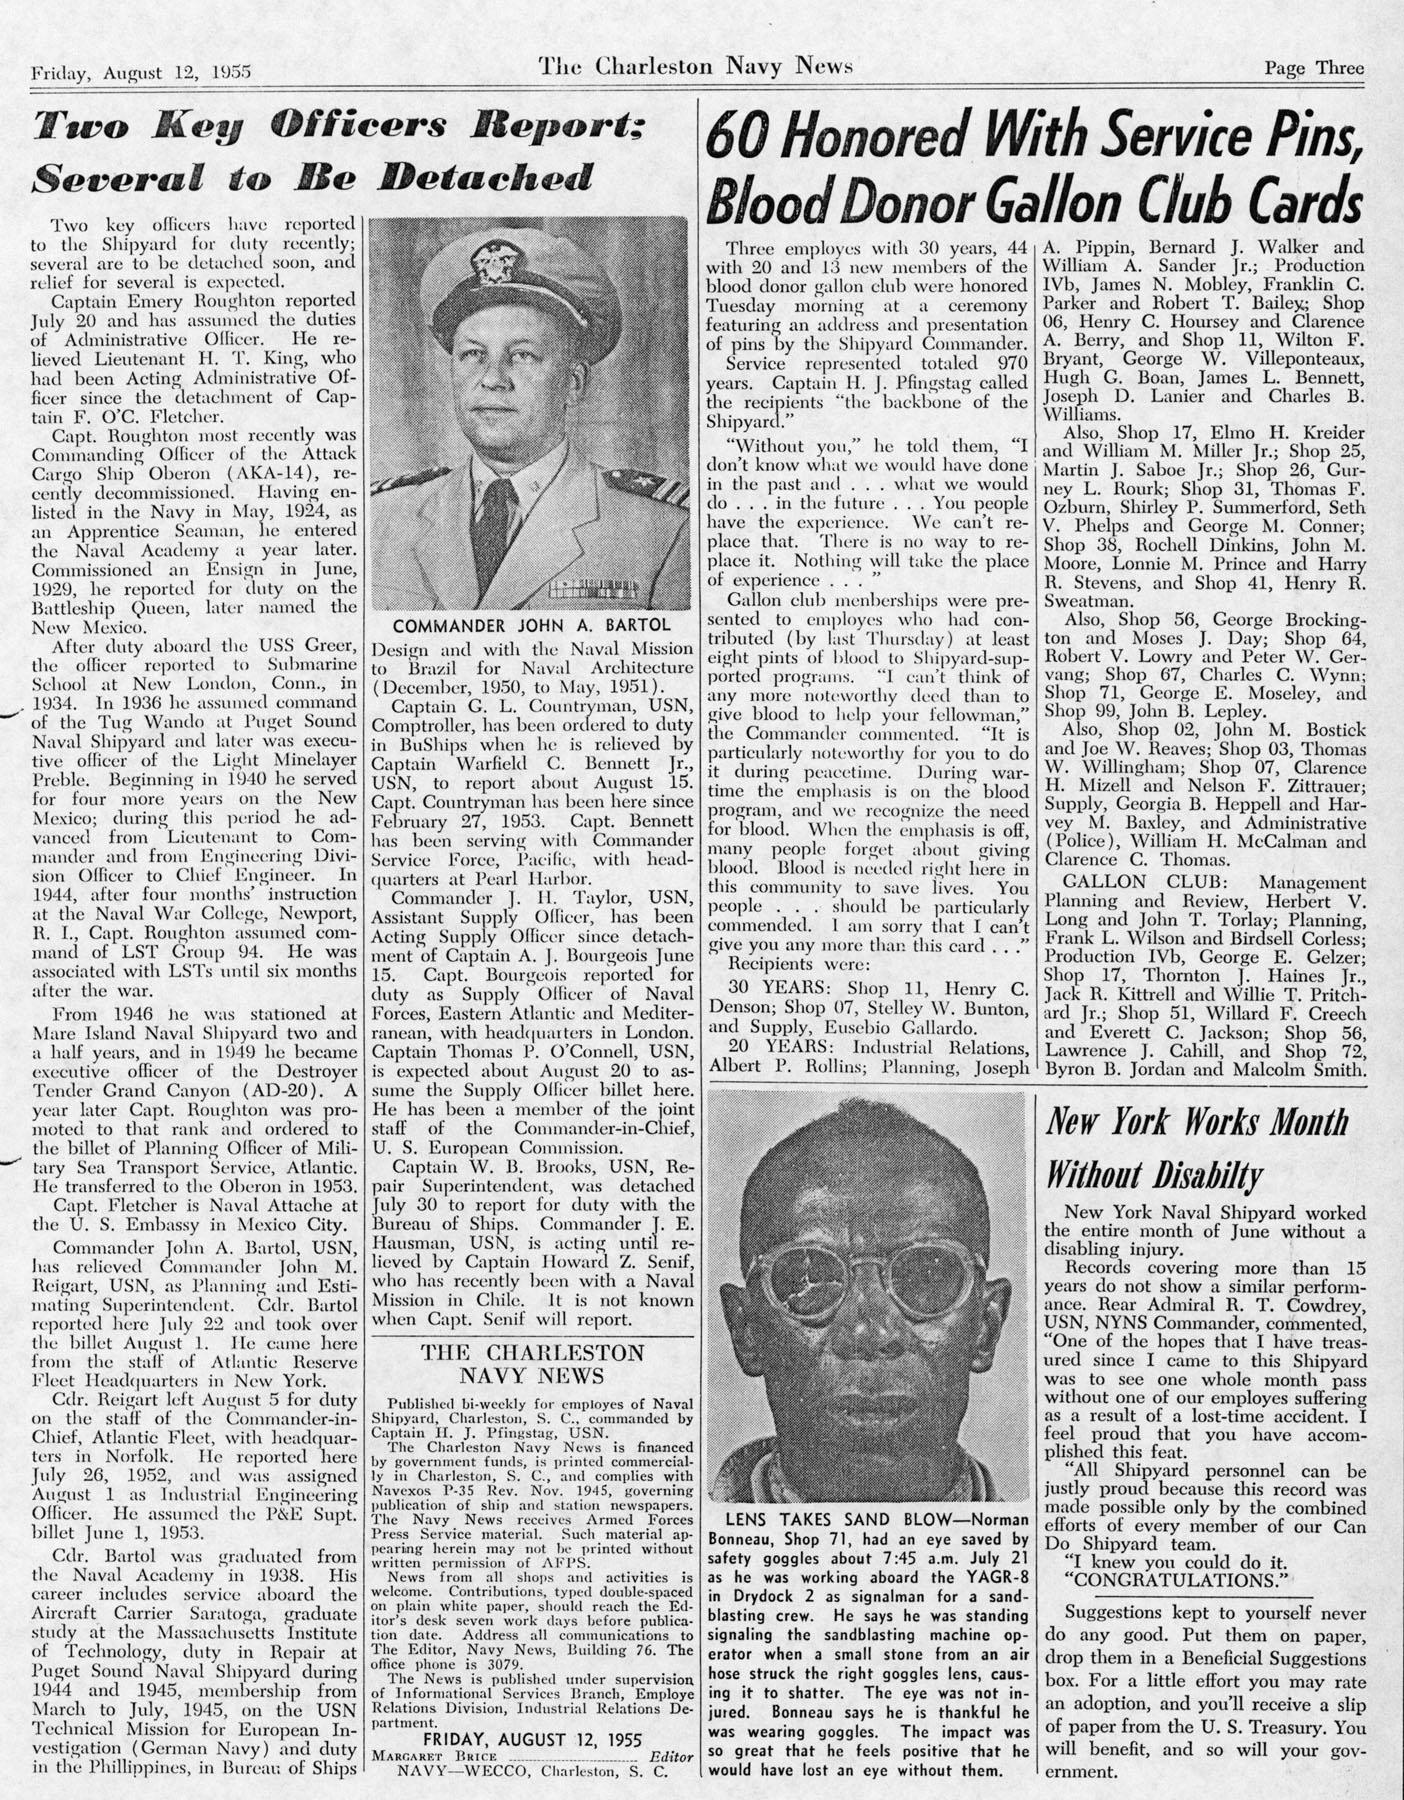 The Charleston Navy News, Volume 14, Edition 2, page iii